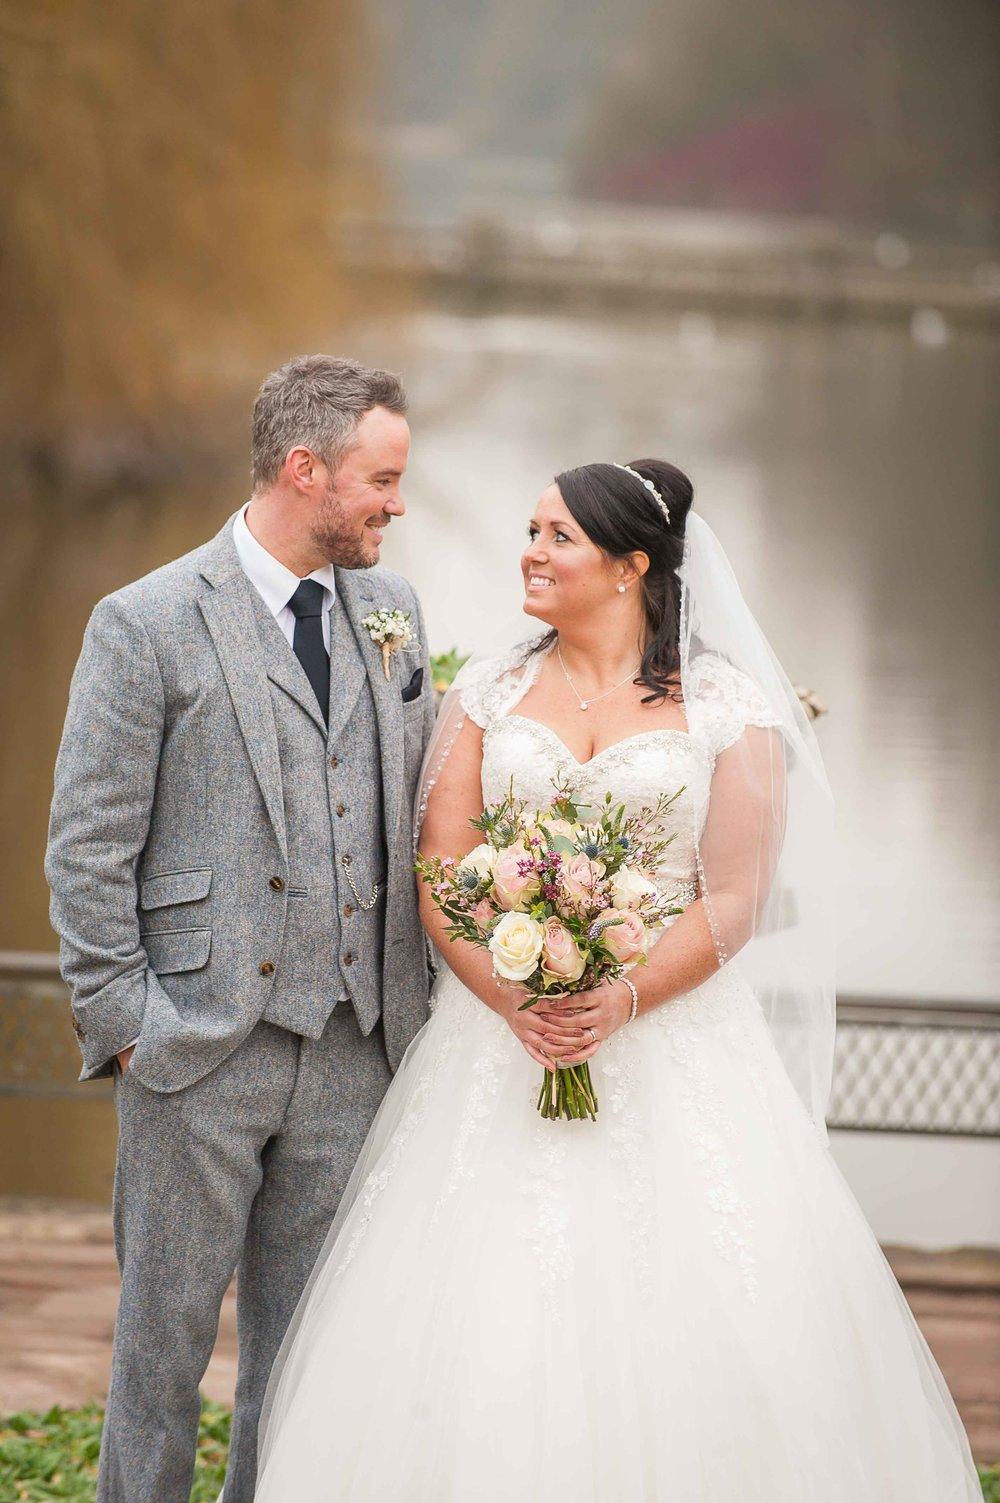 14.02.17 - Matt-Faye-Coombe-Abbey-Valentine-Wedding-Charnwood-Photography-1060.jpg